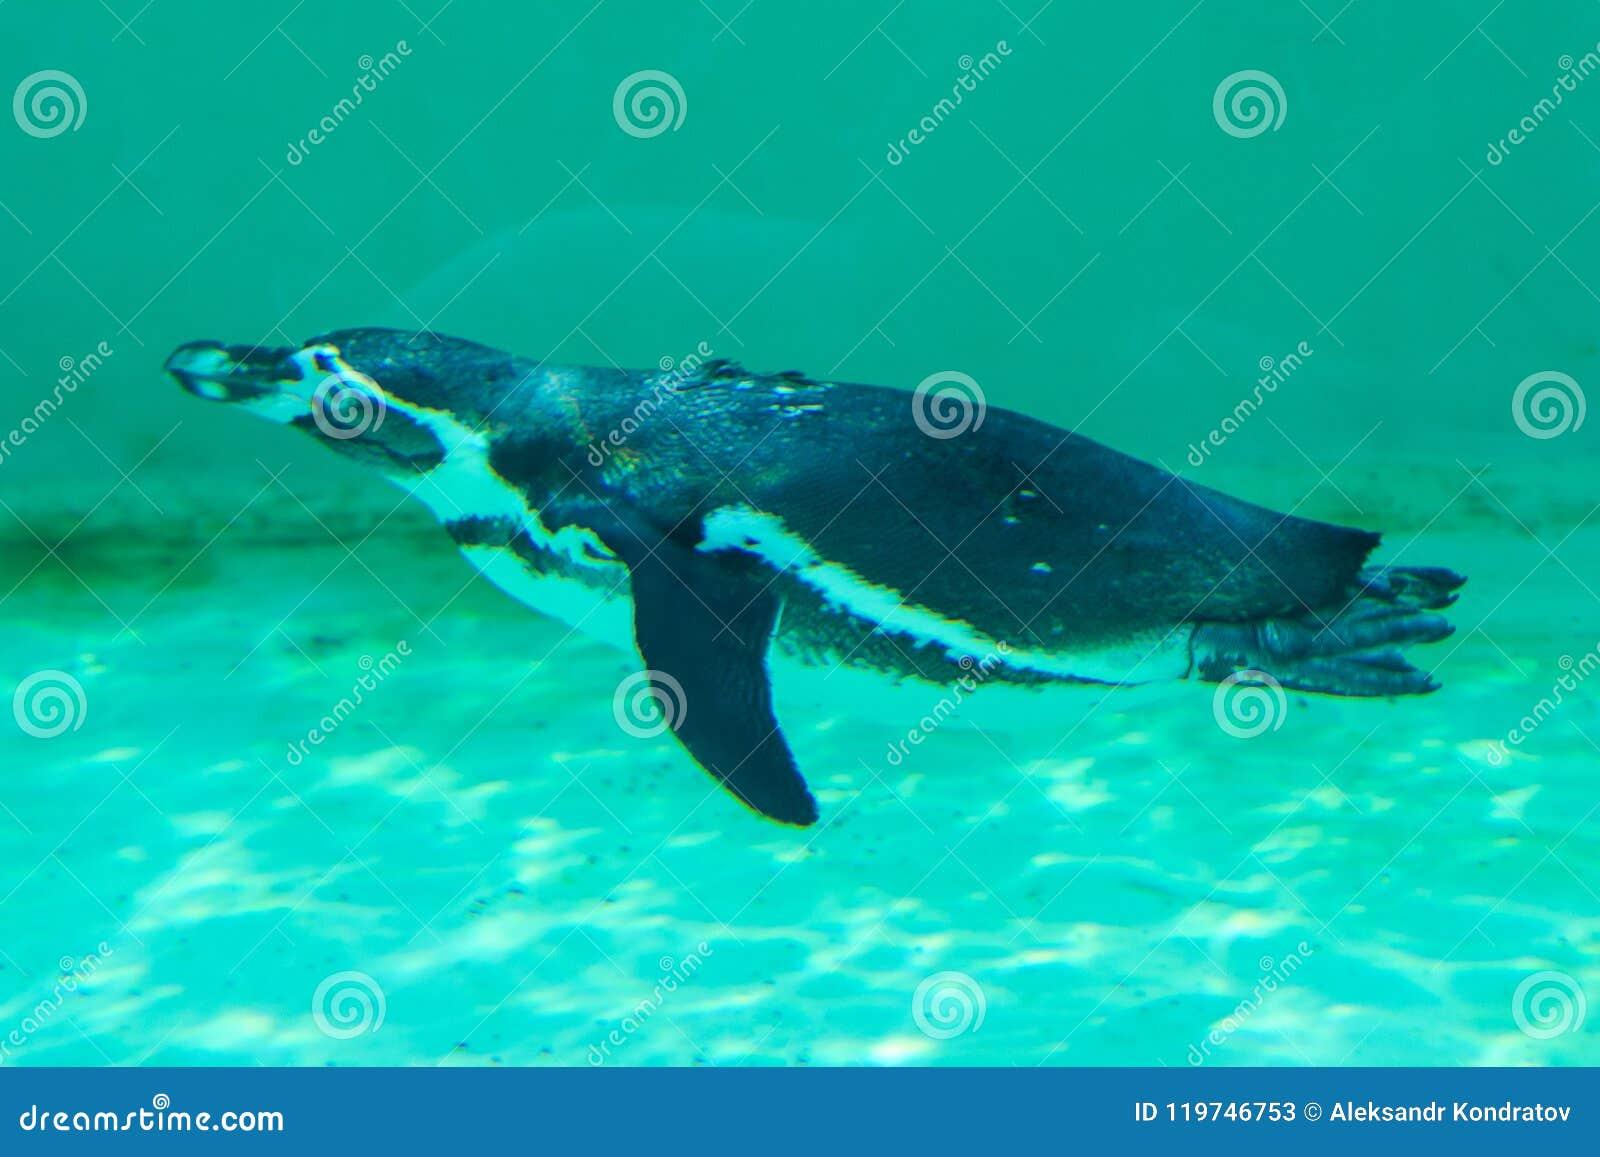 The little gumboldt penguin floats alone